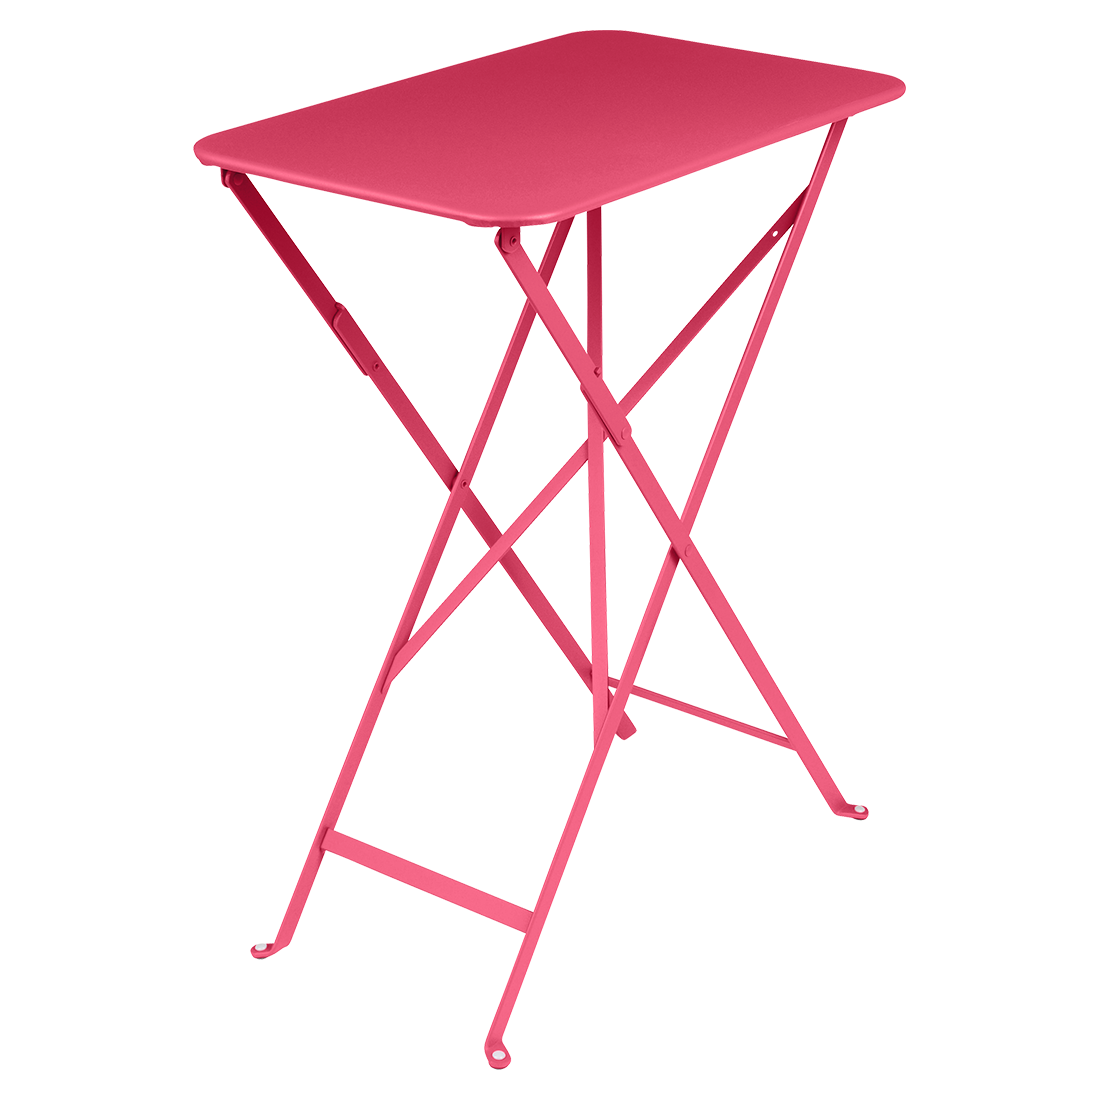 petite table metal, table 2 personnes, table metal beige, petite table fermob